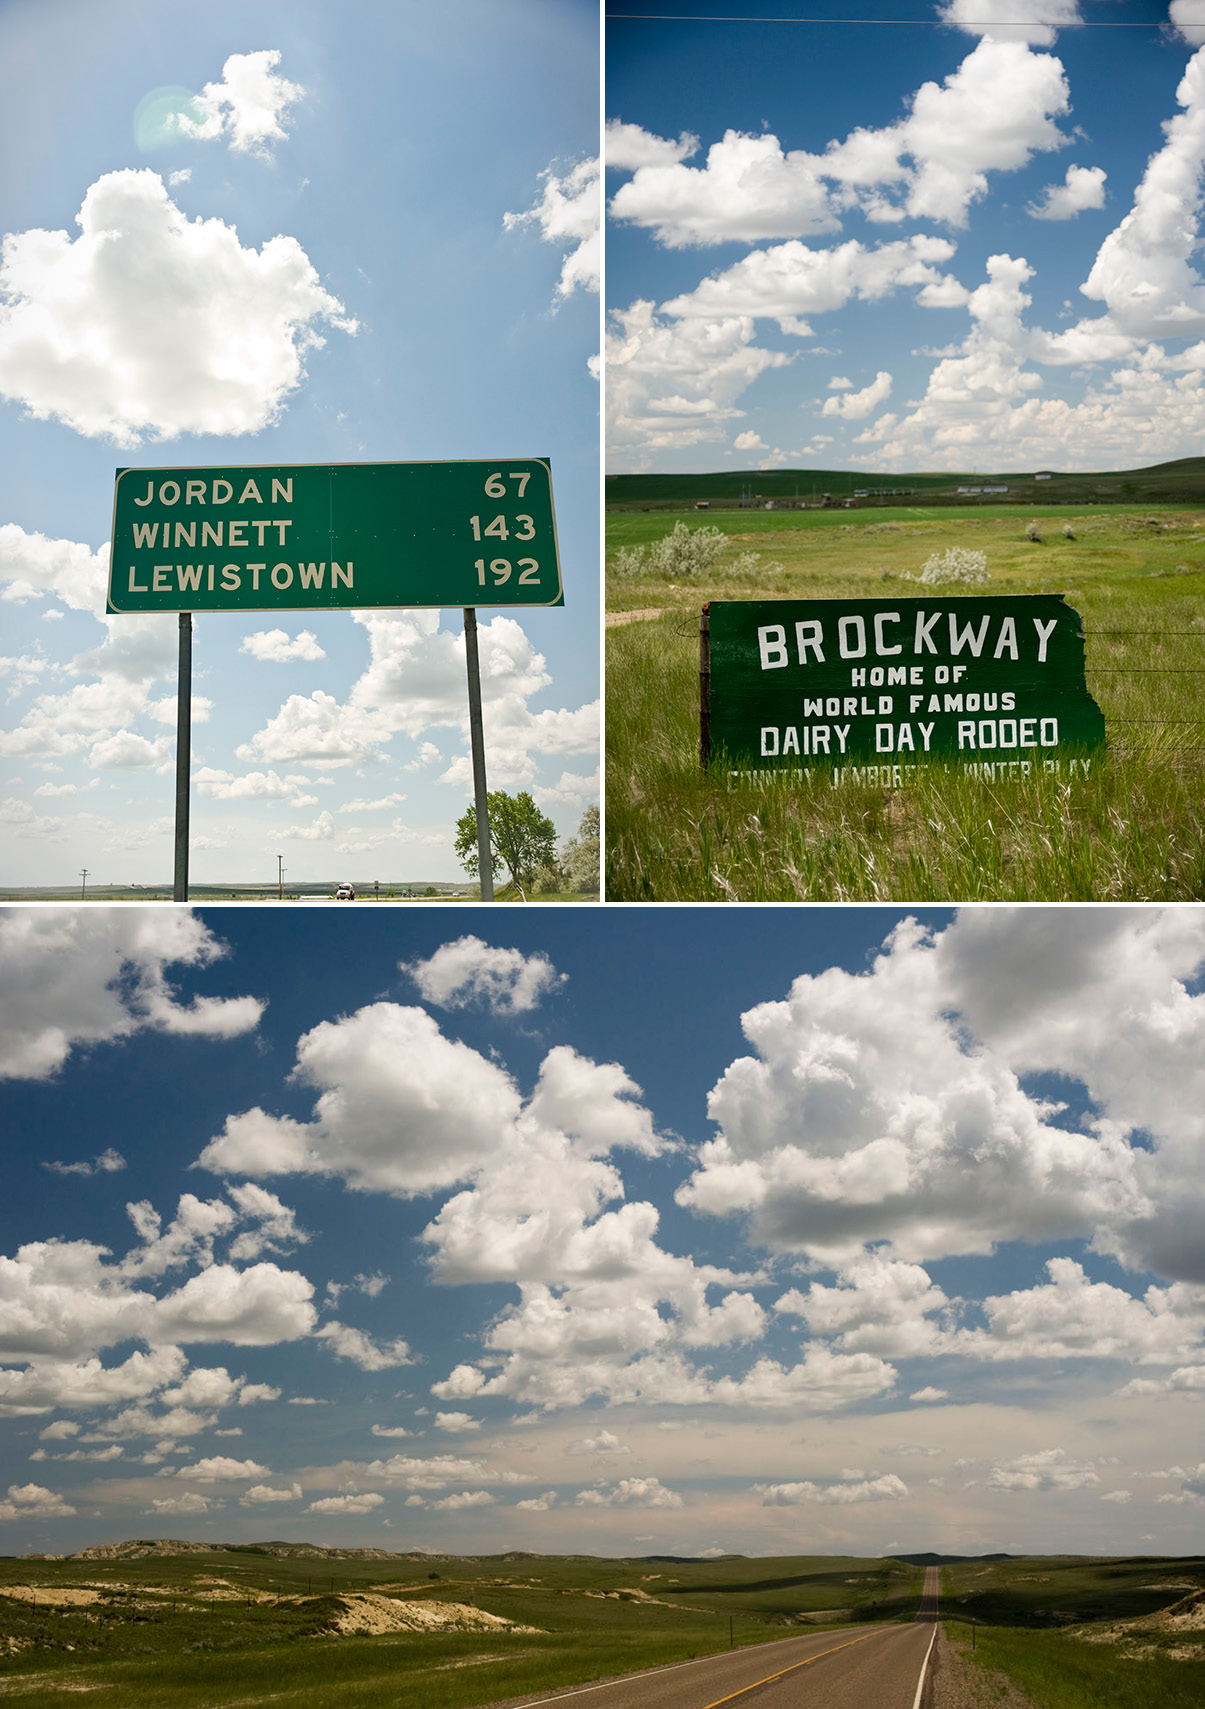 Montana mccone county brockway - Circle Collage 7